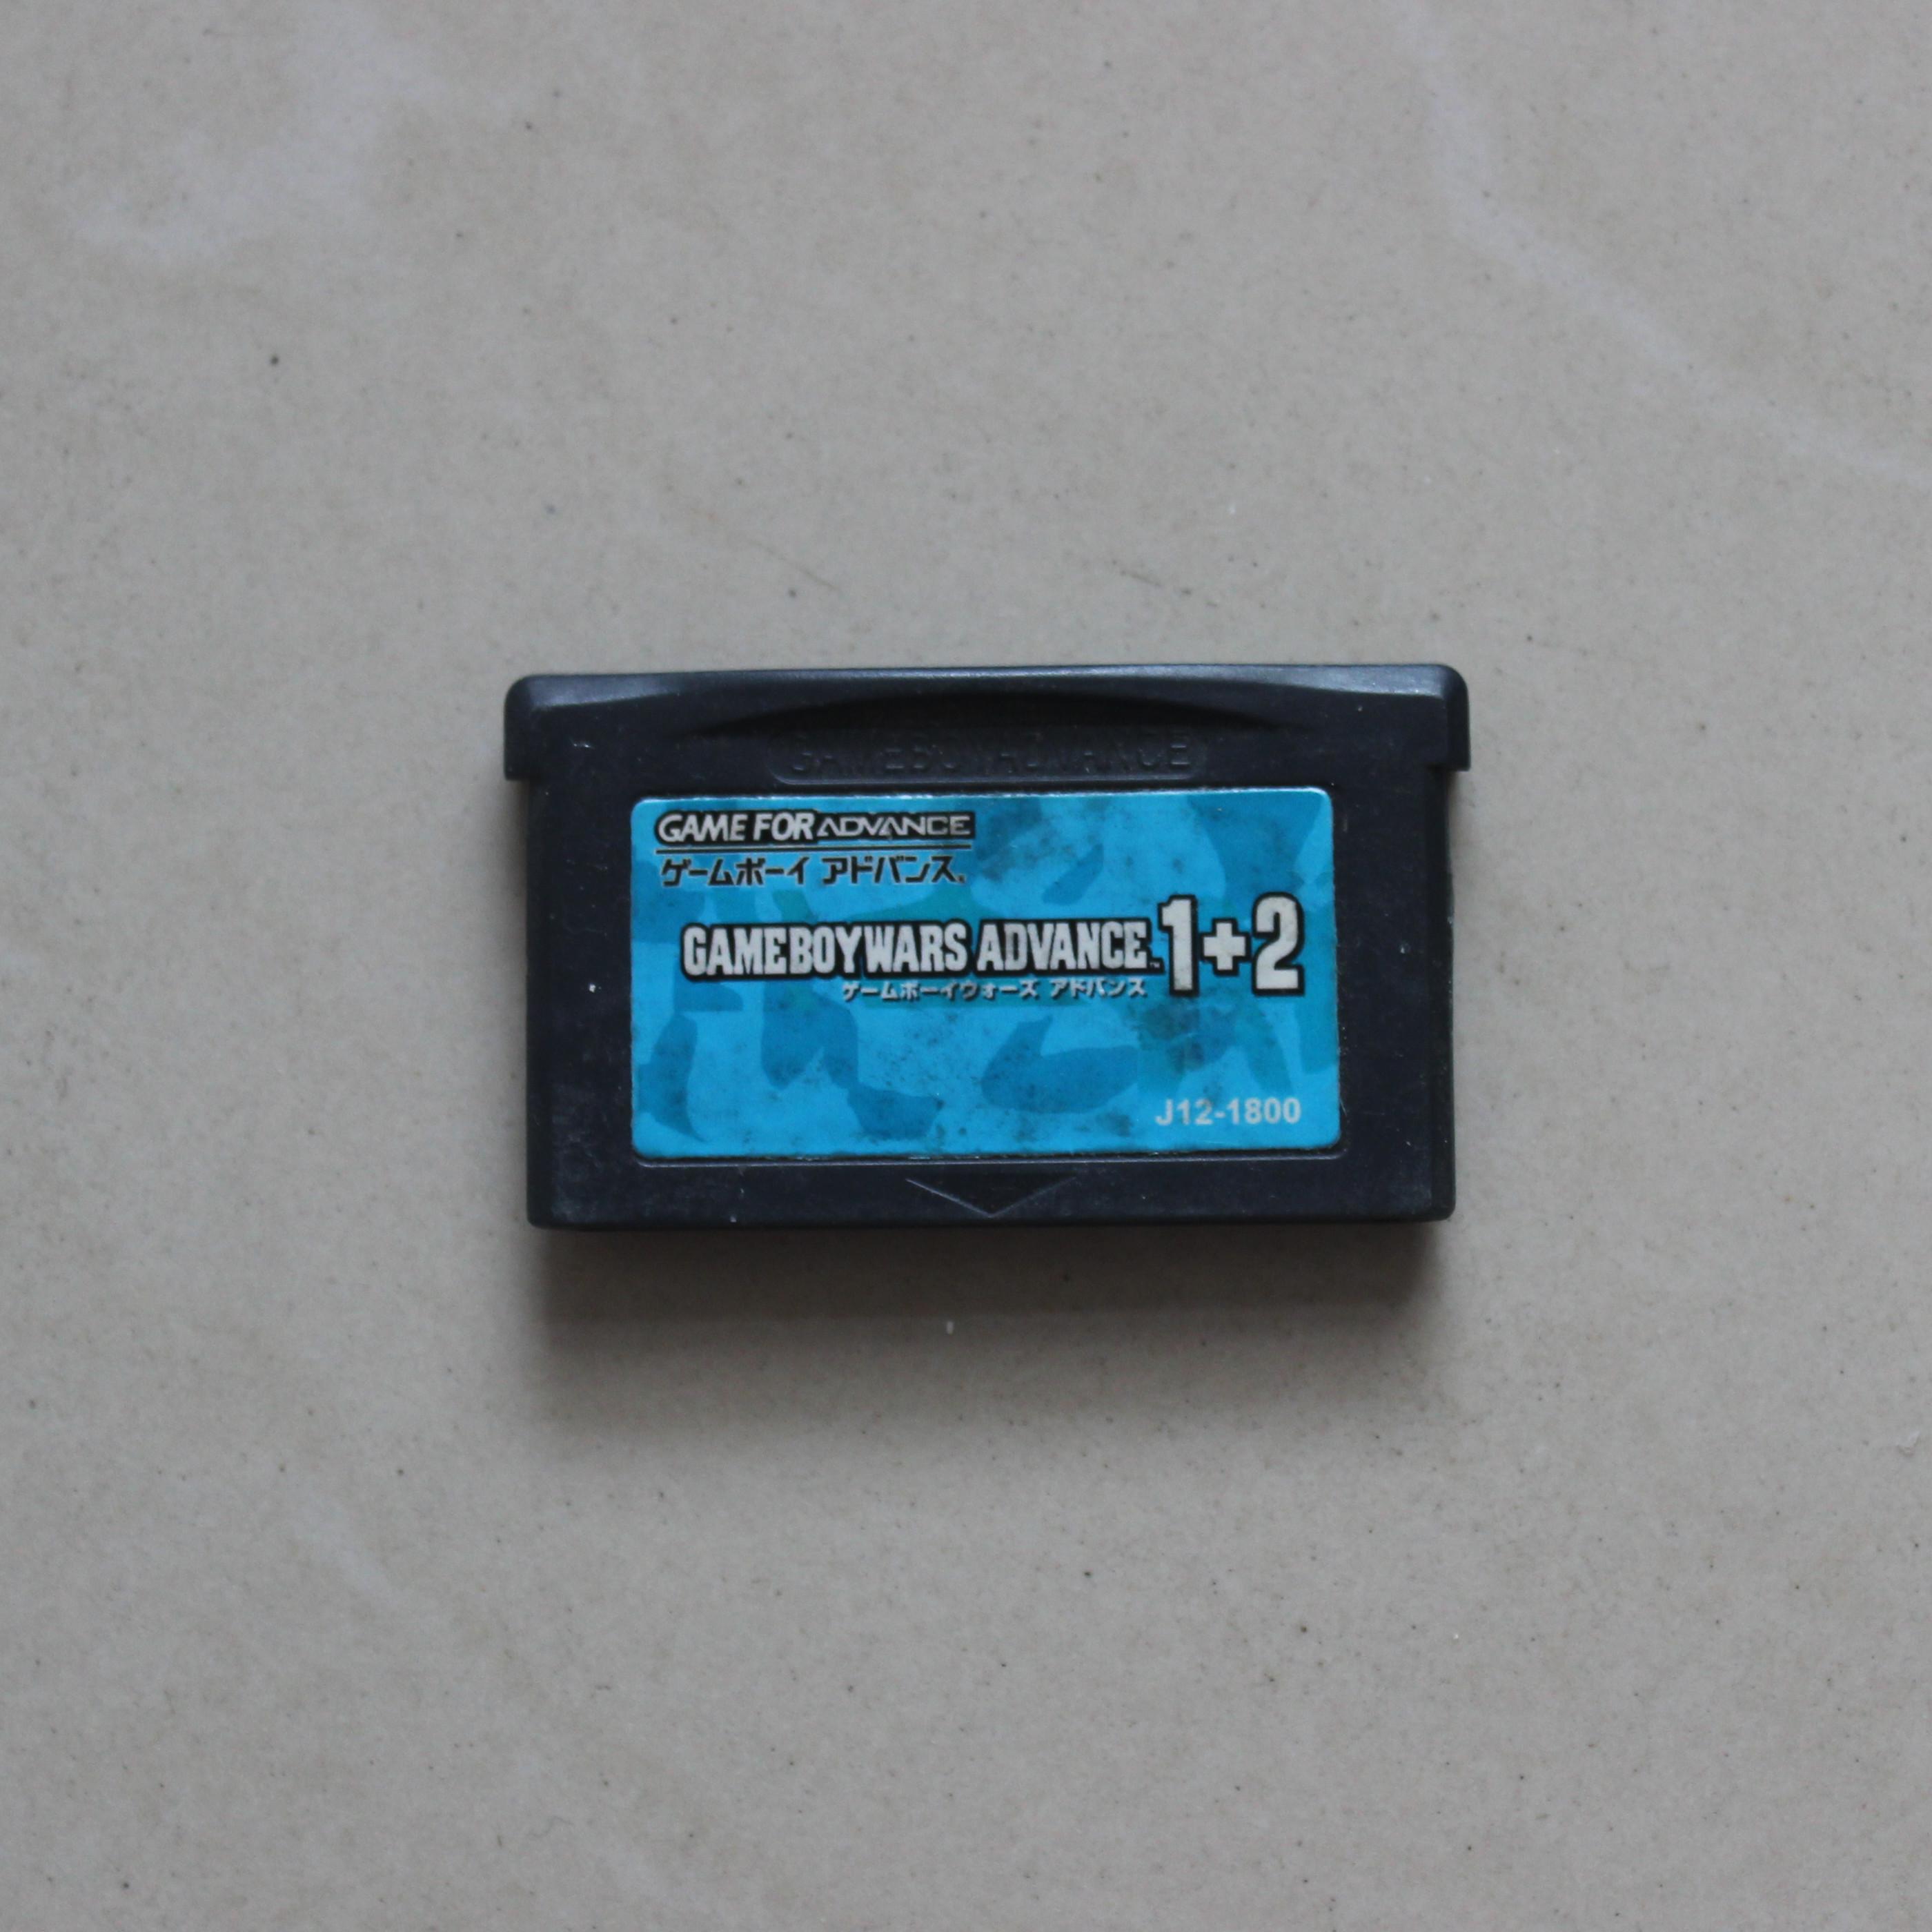 GBM NDSL GBASP GBA游戏卡带 高级战争1+2 日文版 黑洞的升起